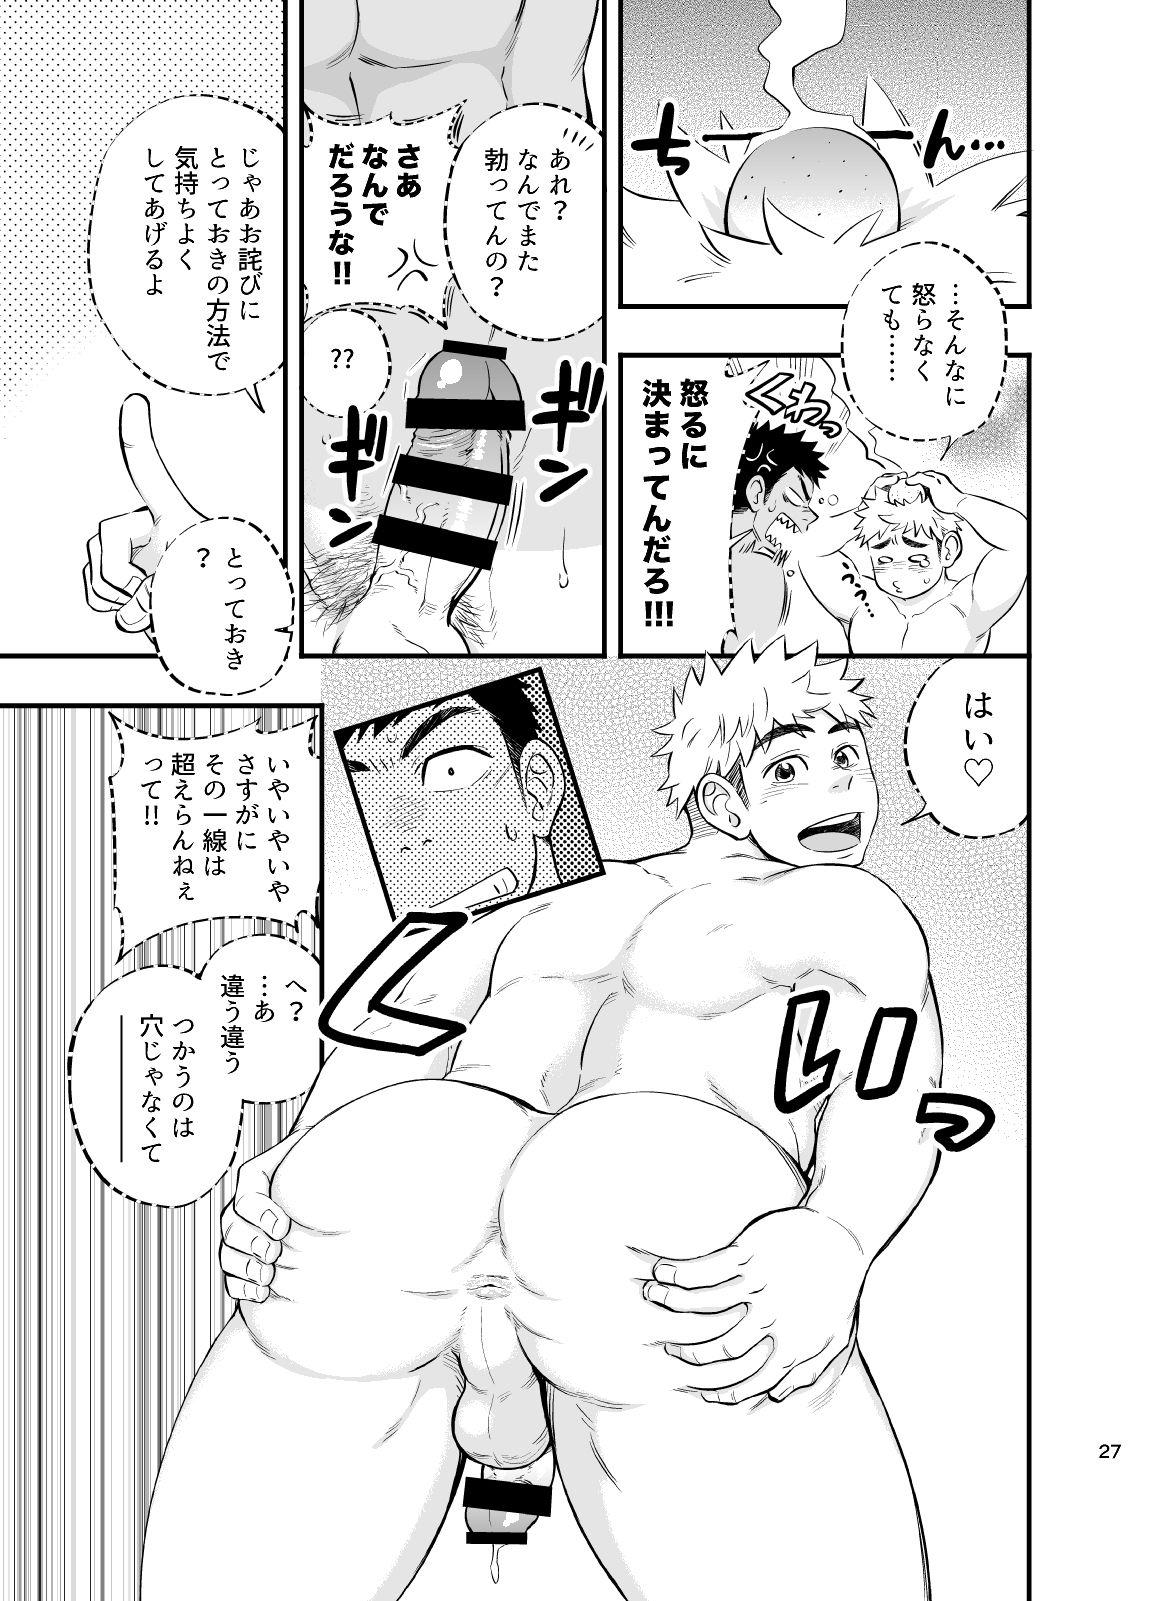 Locker Room Accident 27